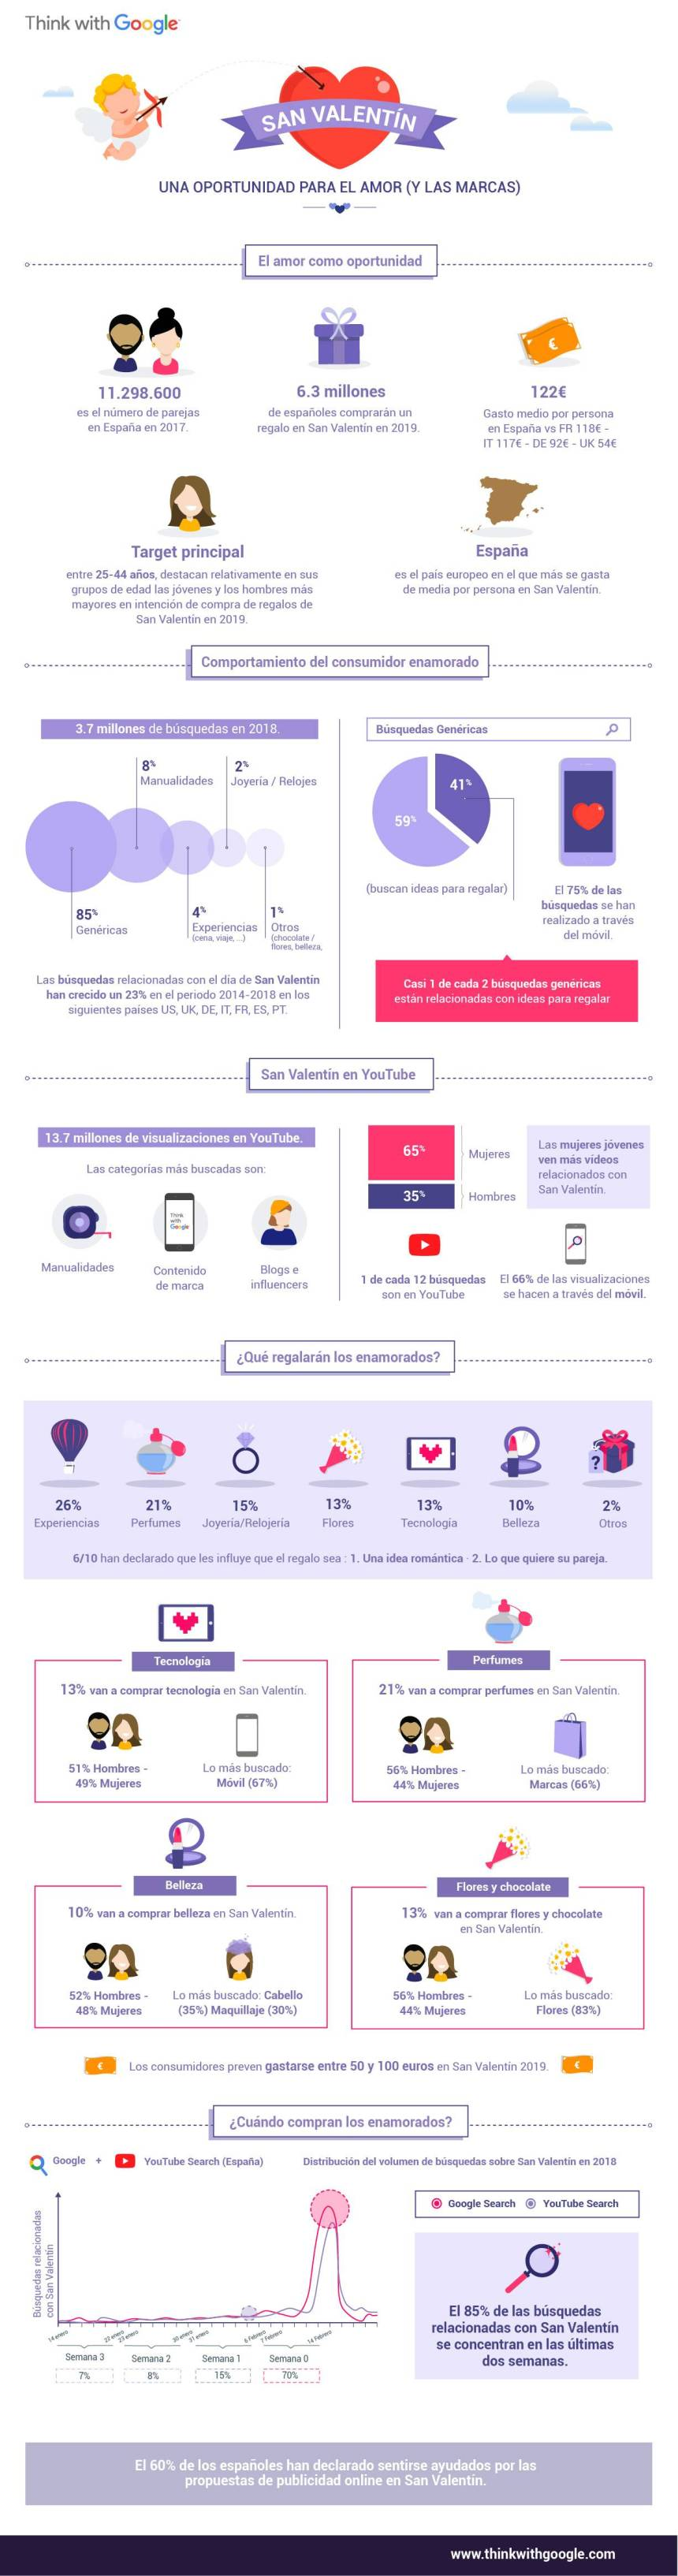 Marketing para San Valentín #infografia #infographic #marketing